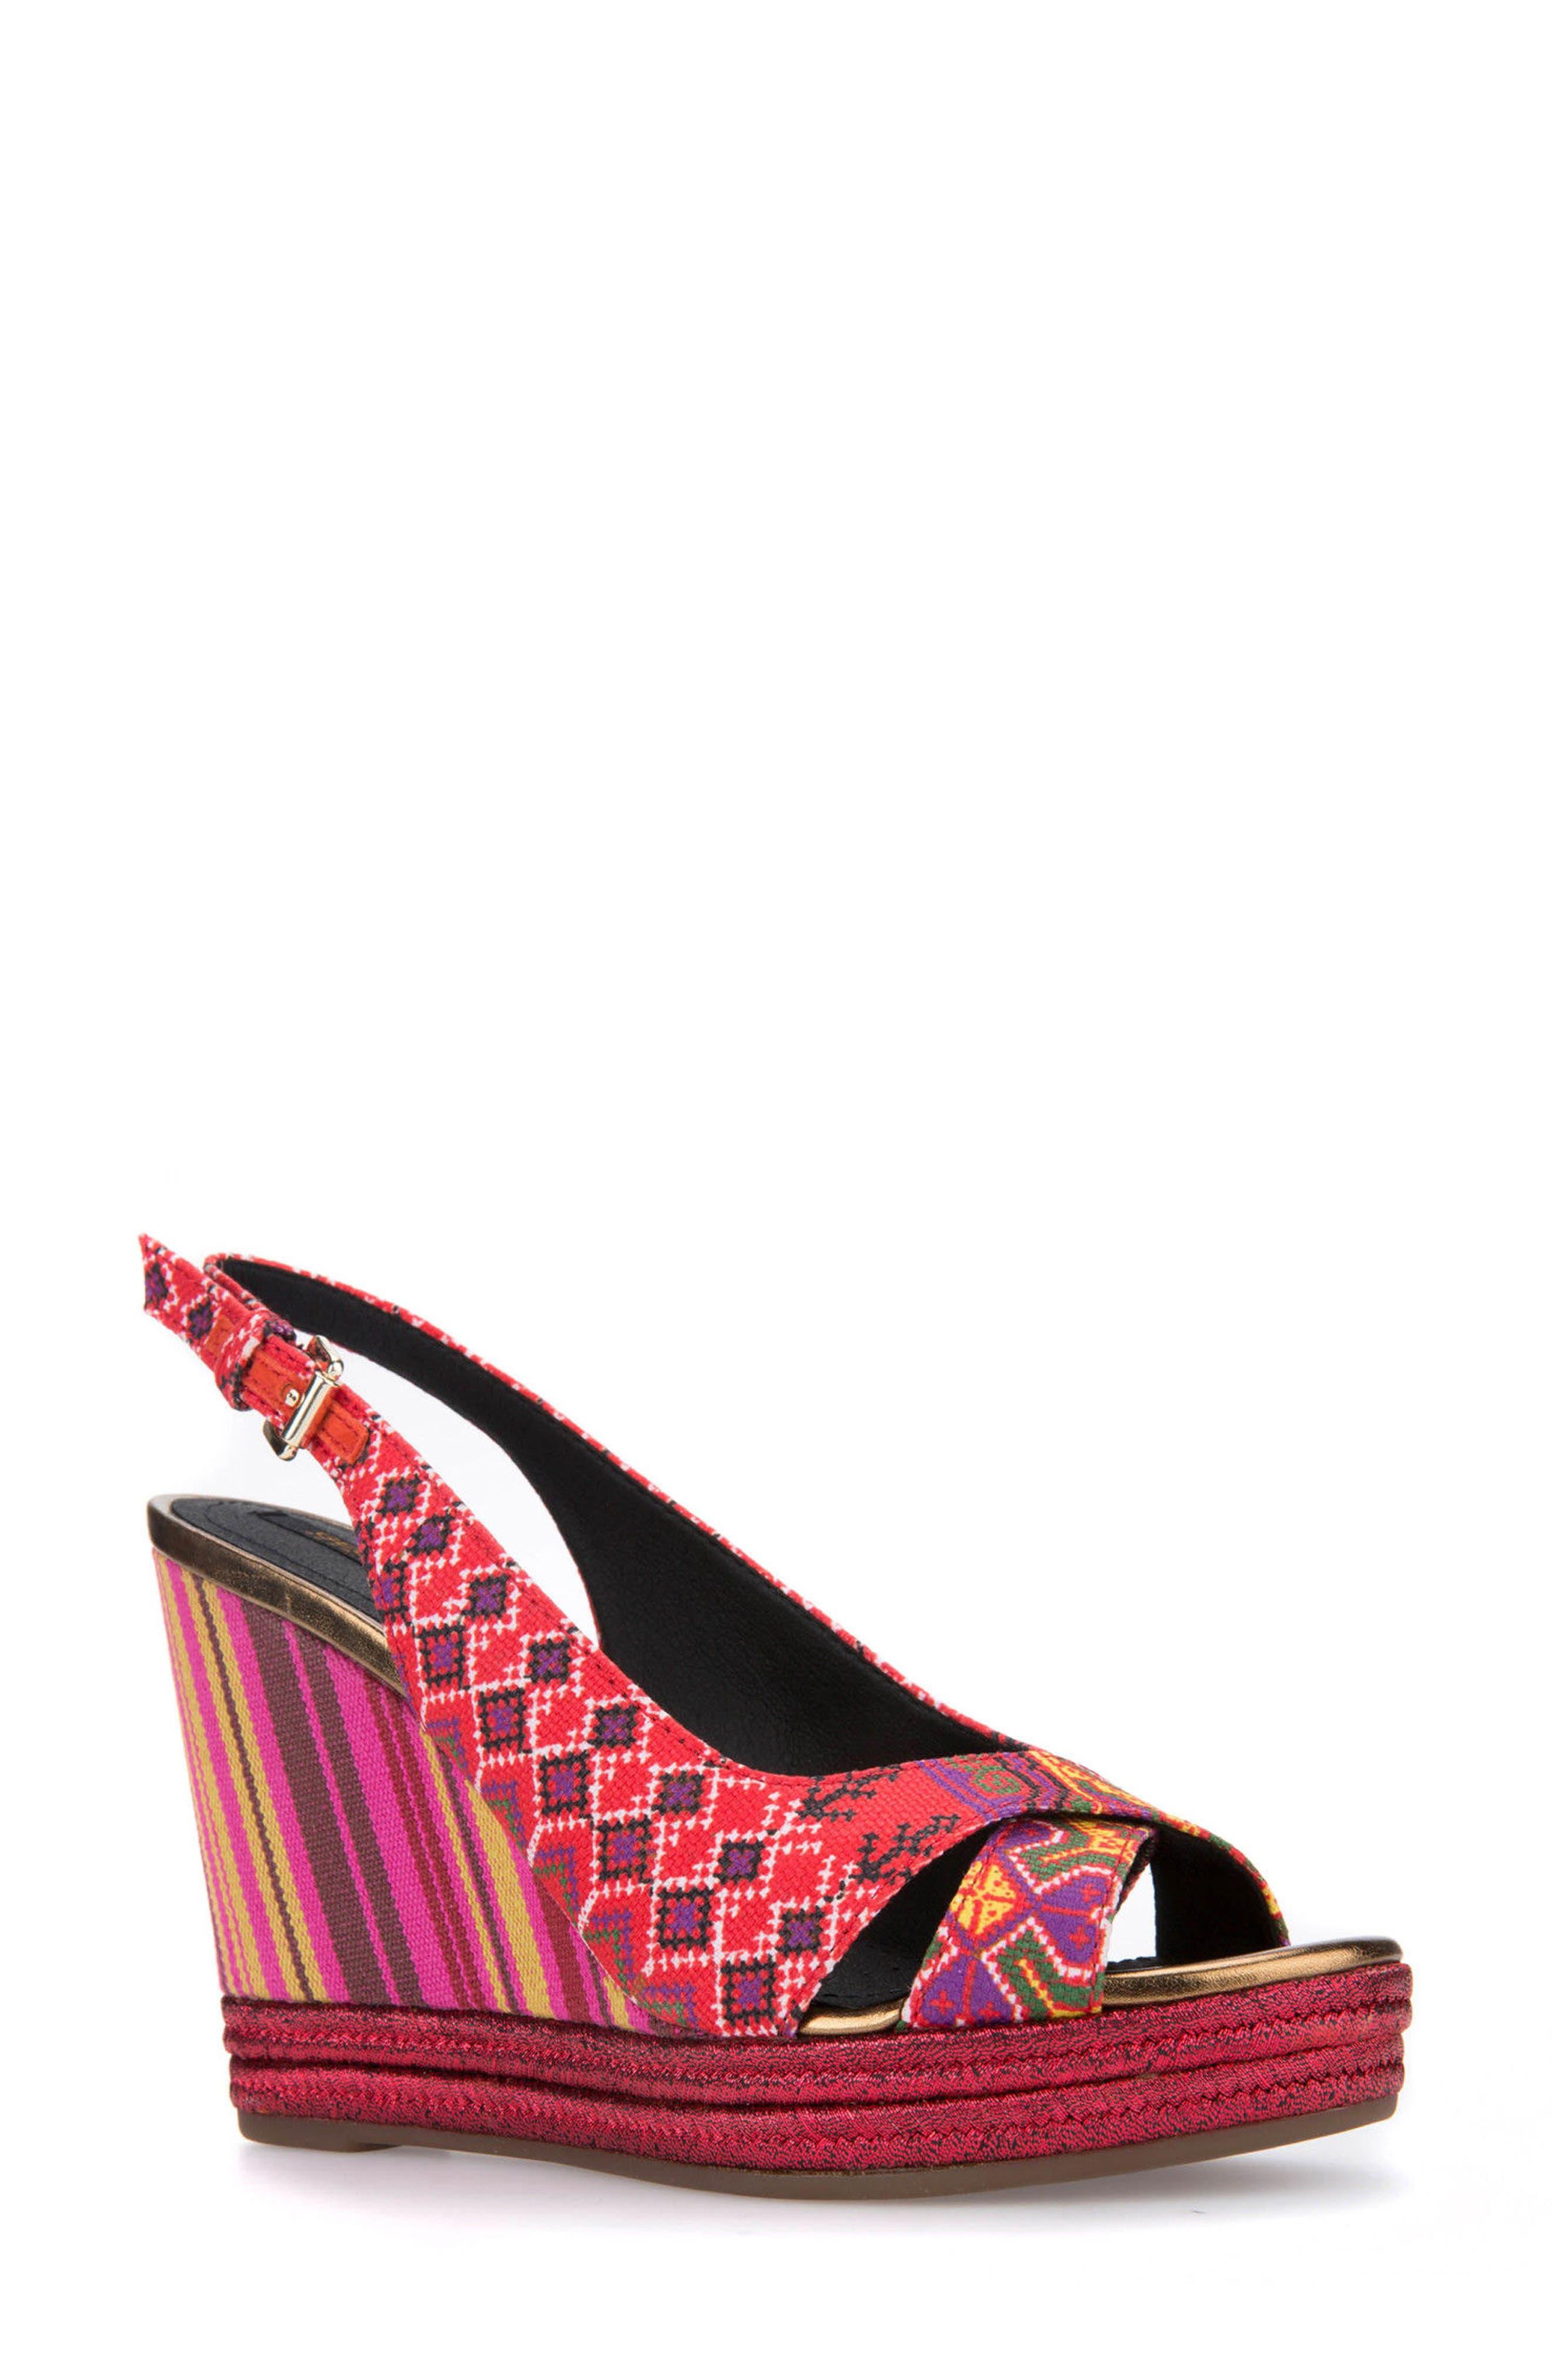 Geox Janira 13 Espadrille Wedge Sandal (Women)